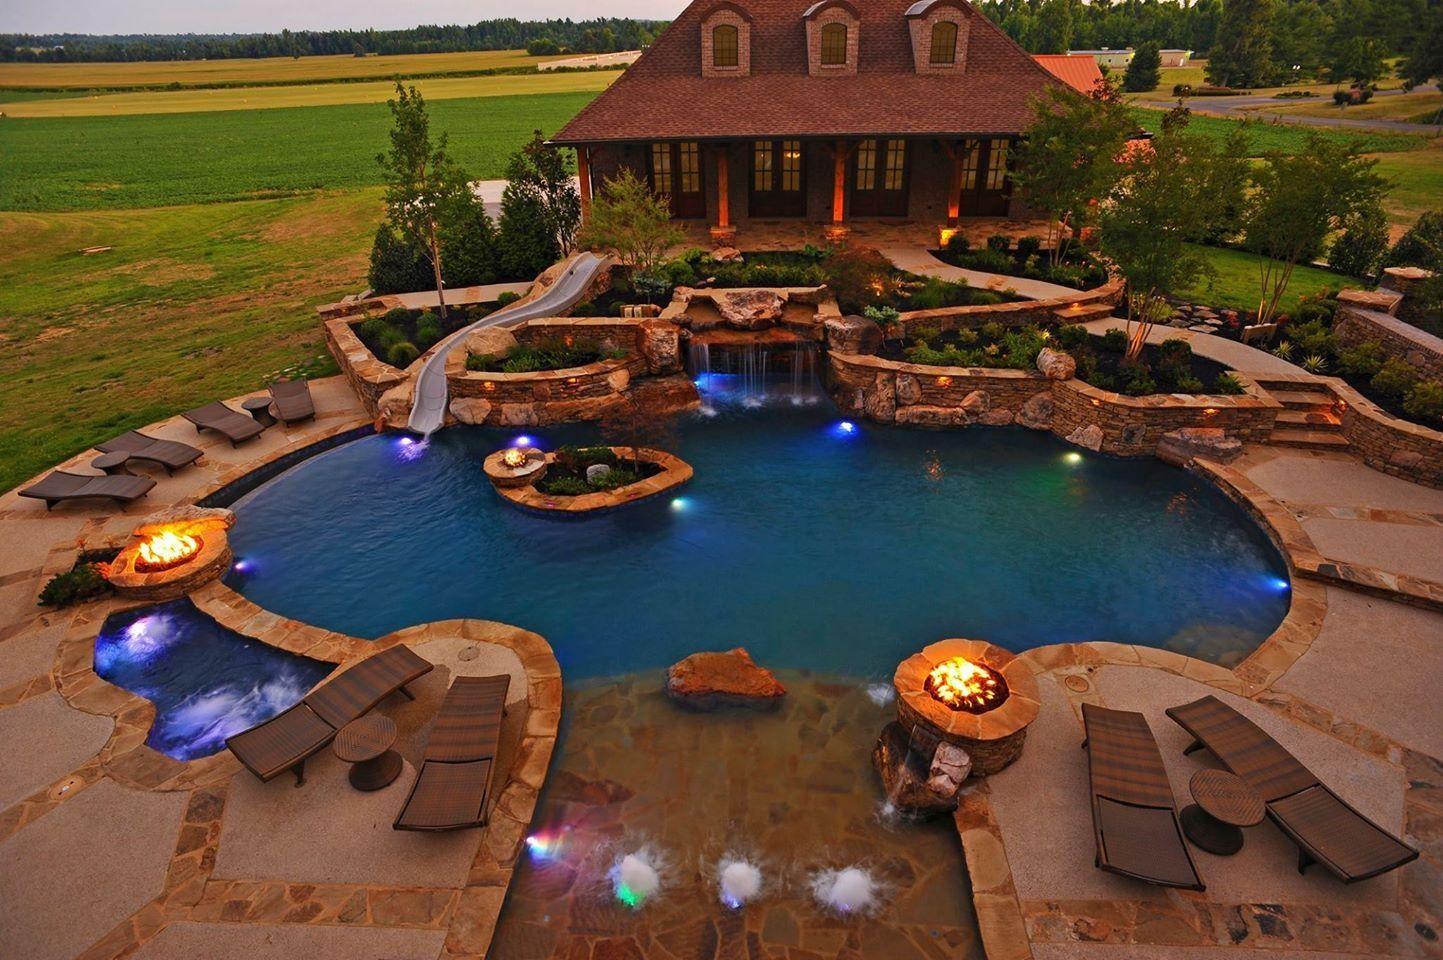 Dreamy | Luxury pools backyard, Backyard pool, Dream pools on Dream Backyard With Pool id=31128